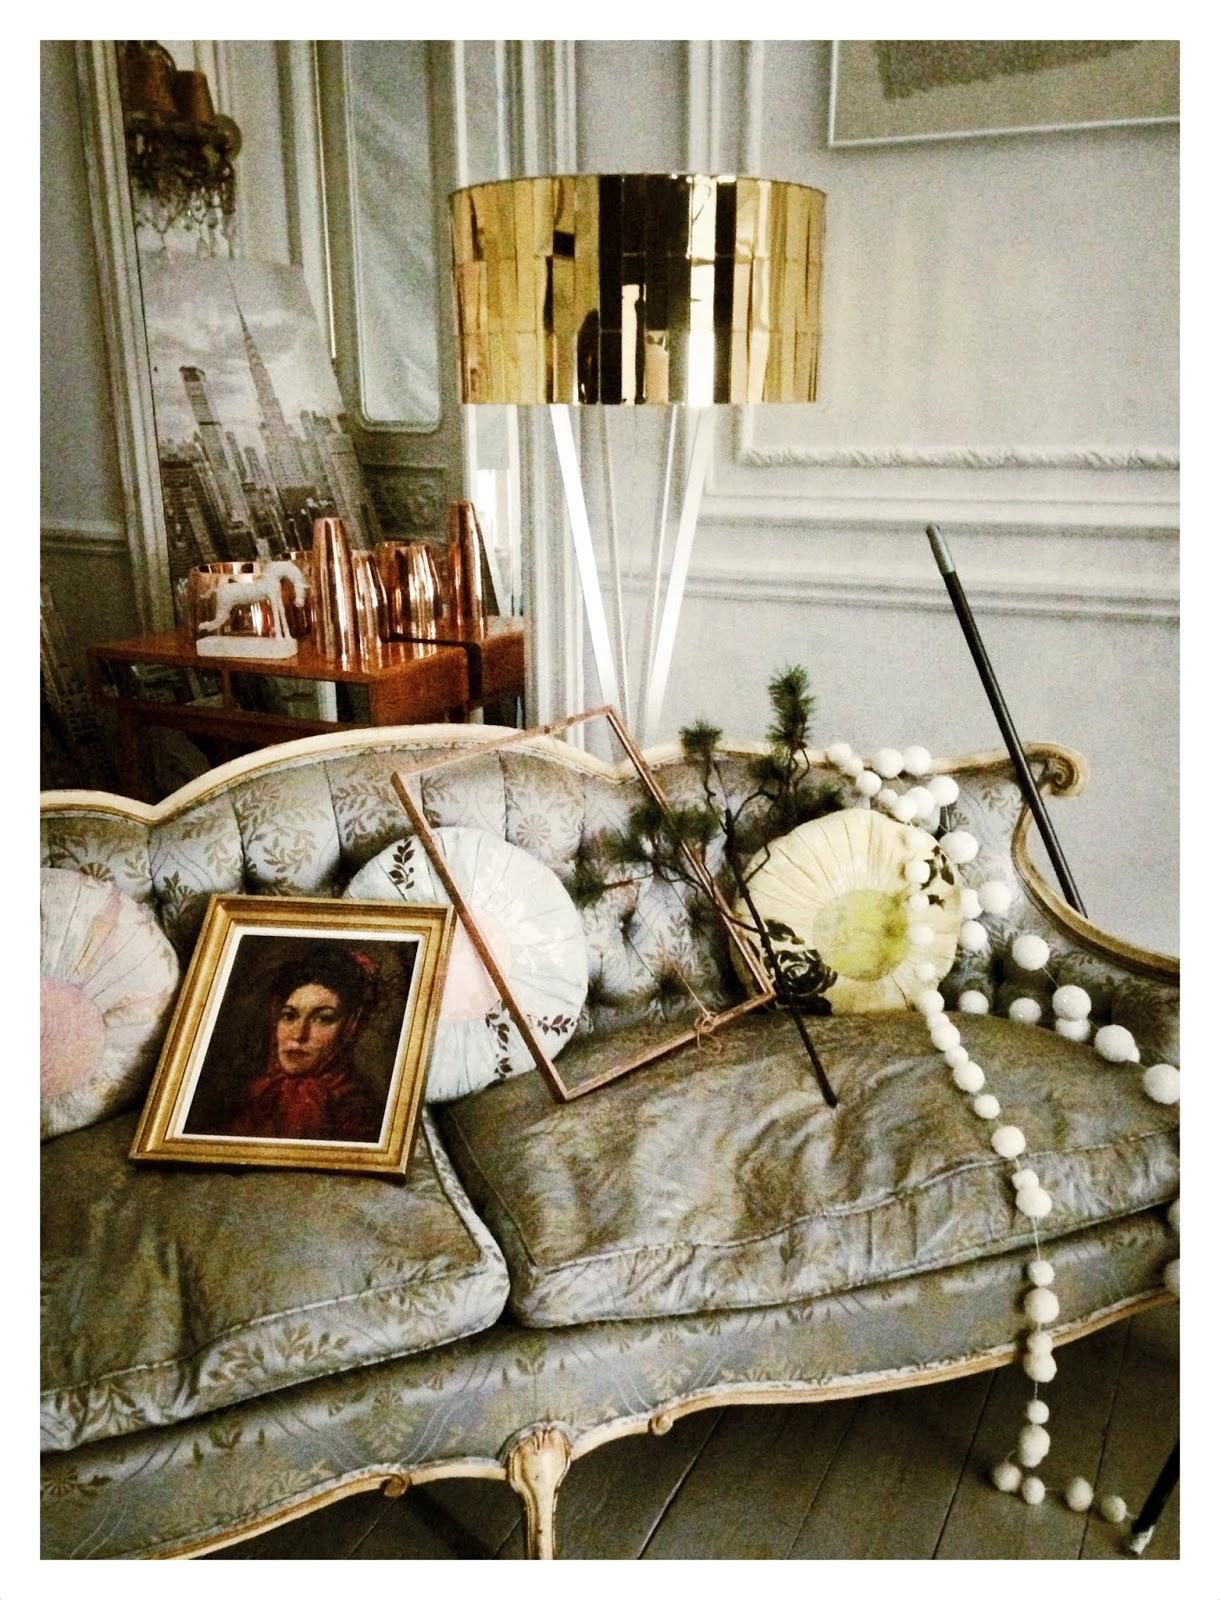 caroline davis, trend-daily blog, mapesbury road, marianne cotterill, vintage, mid century